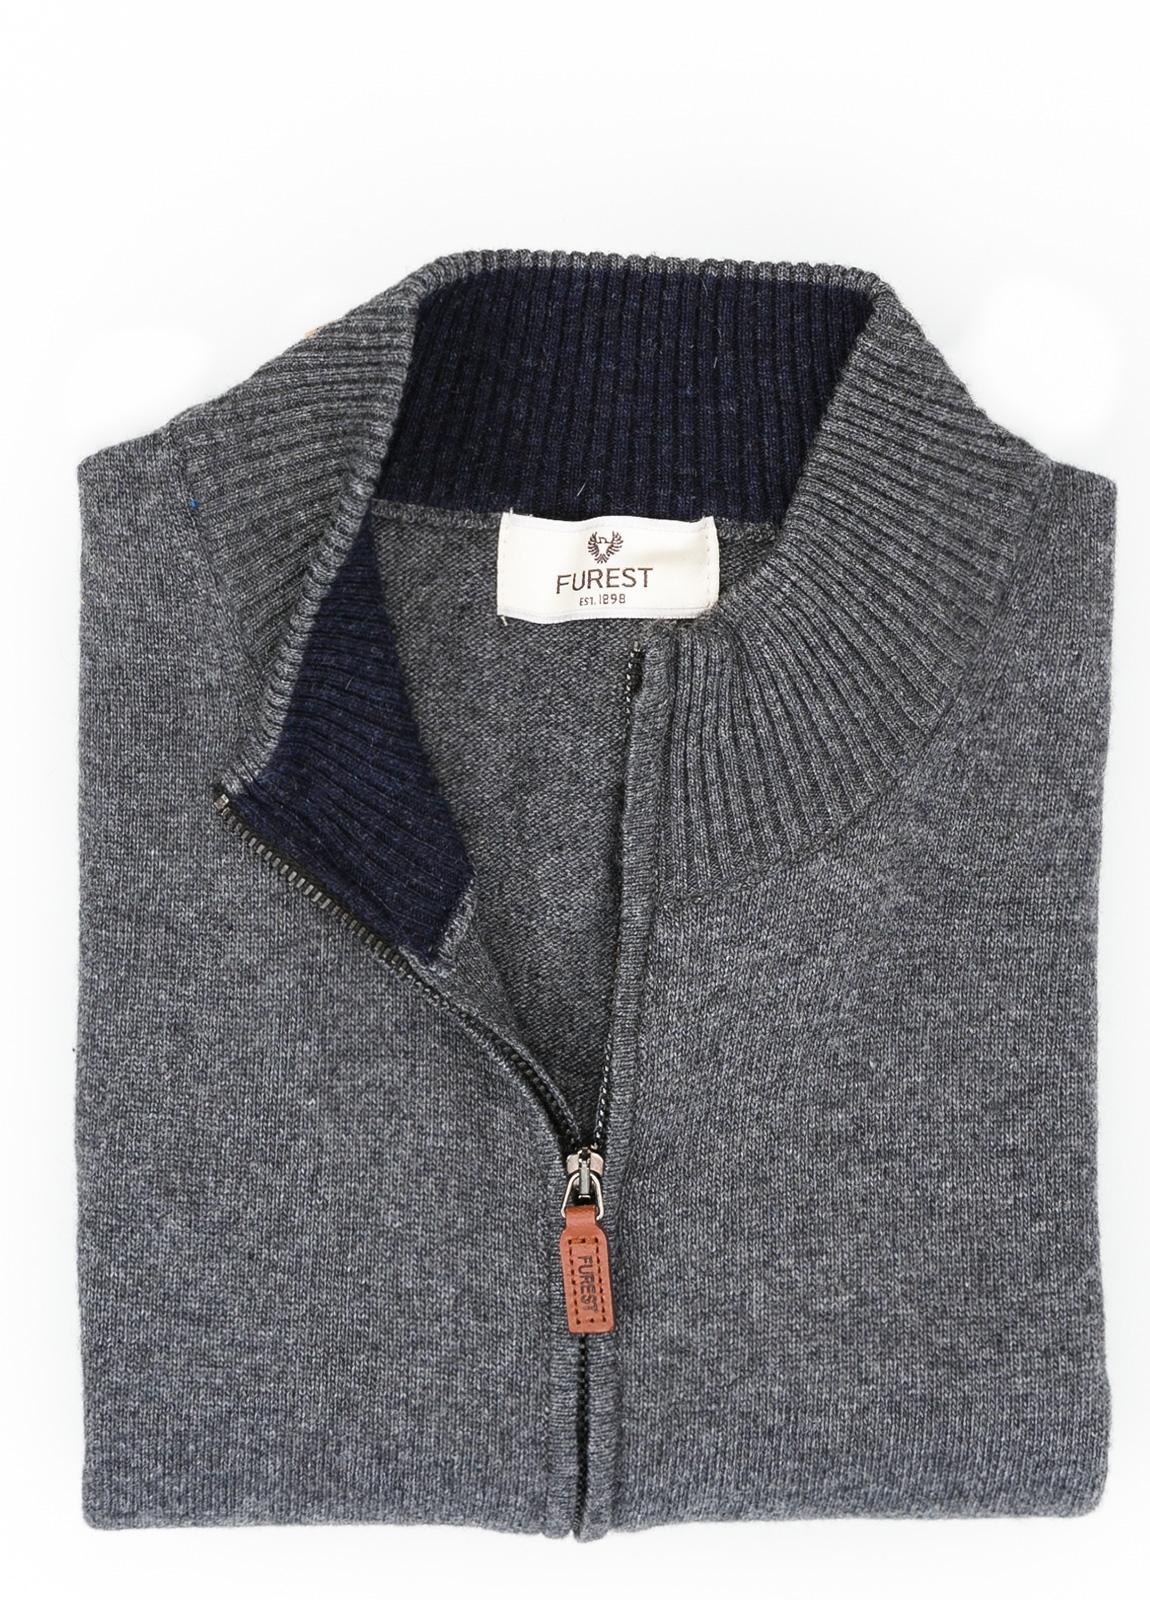 Jersey liso cremallera doble carro, color gris marengo, 40% lana merino, 30% viscosa, 10% cachemire - Ítem1